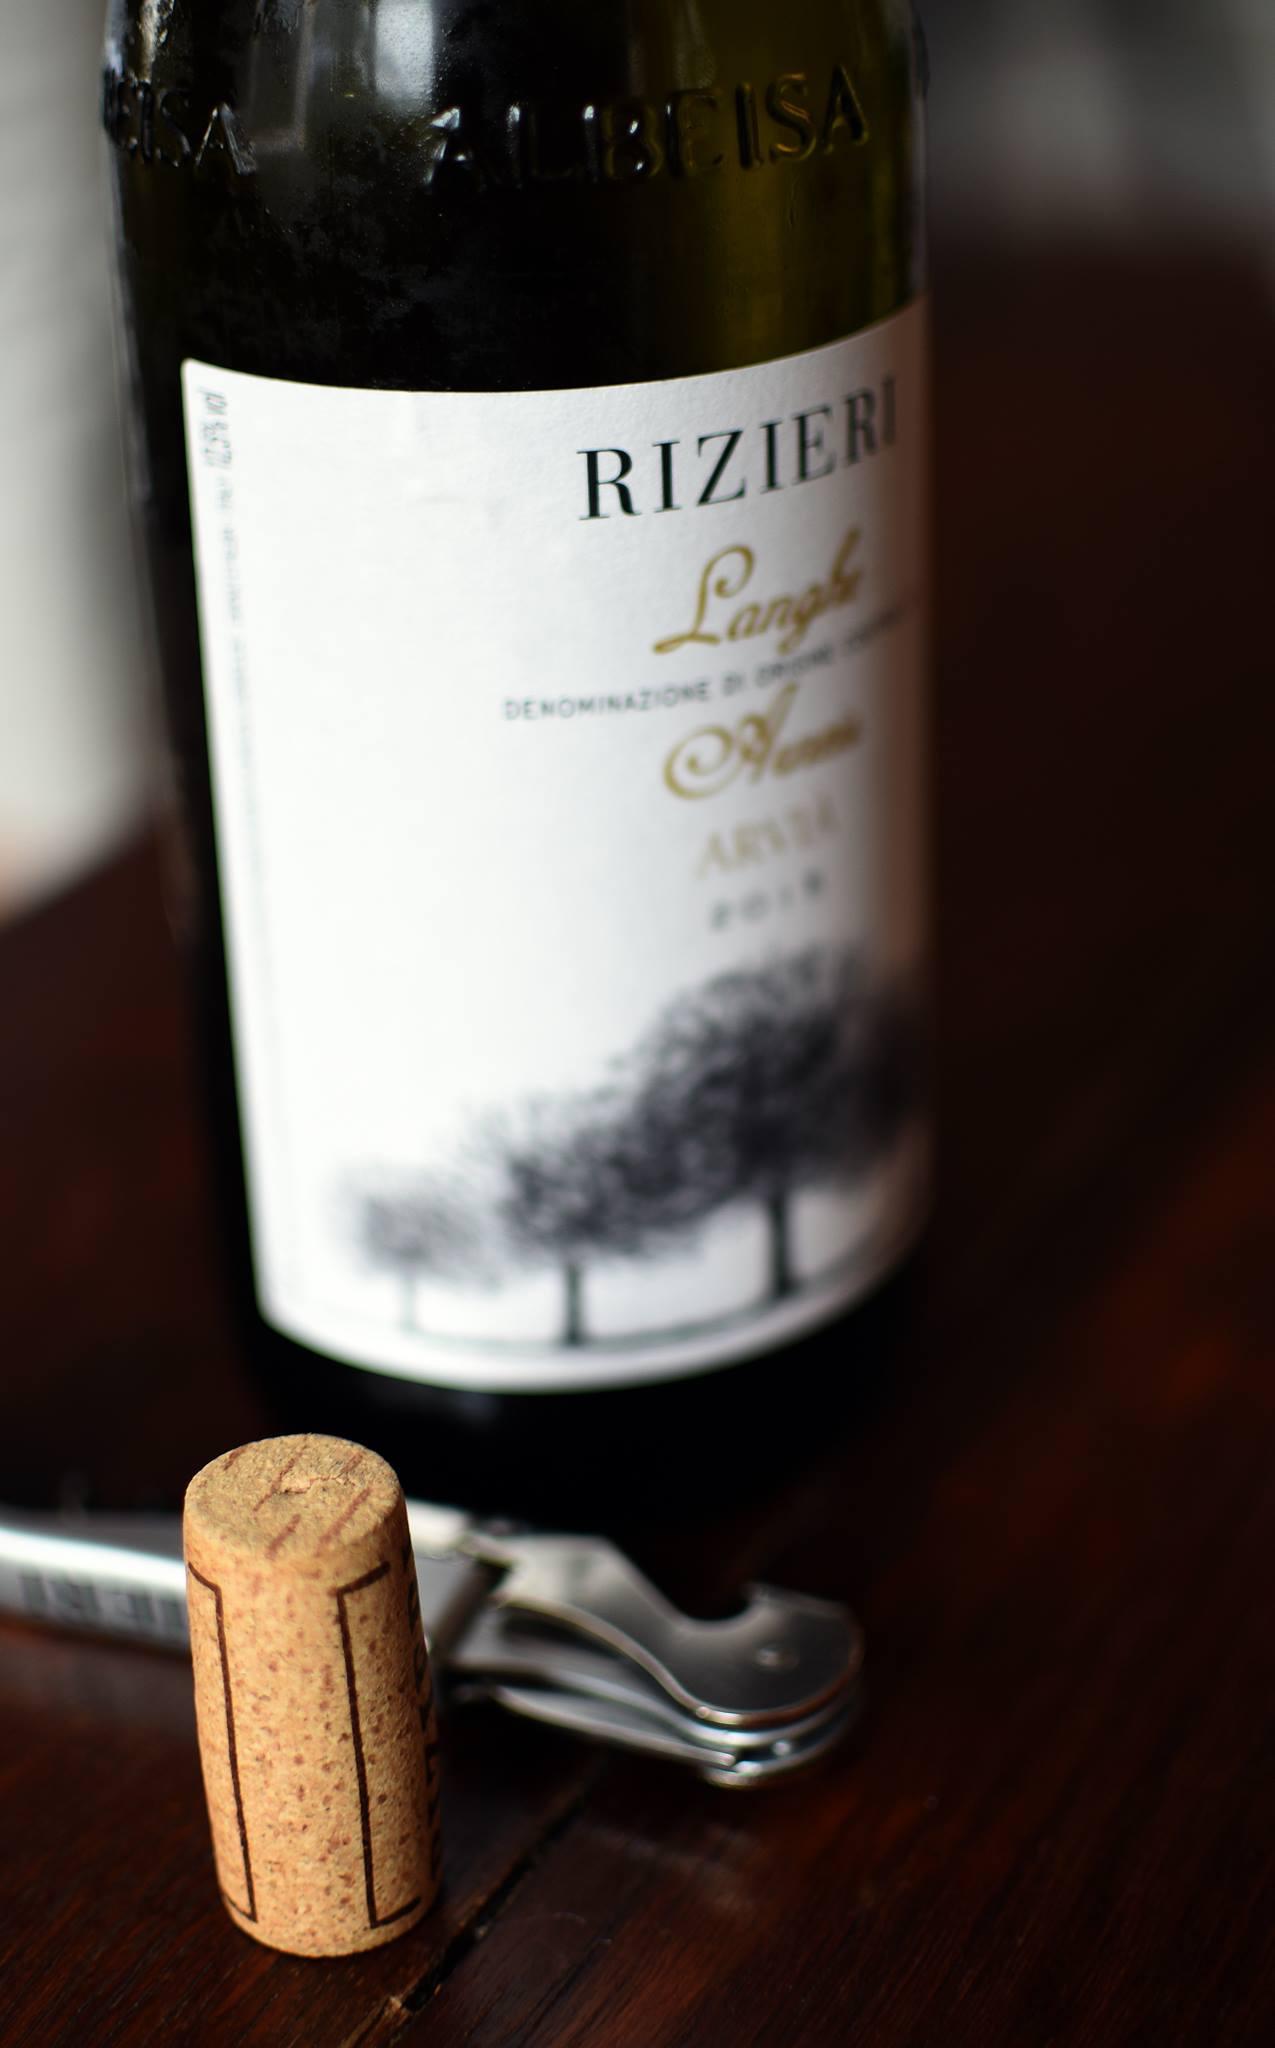 Rizieri Langhe Arneis wine Diano d'Alba winery Piemonte